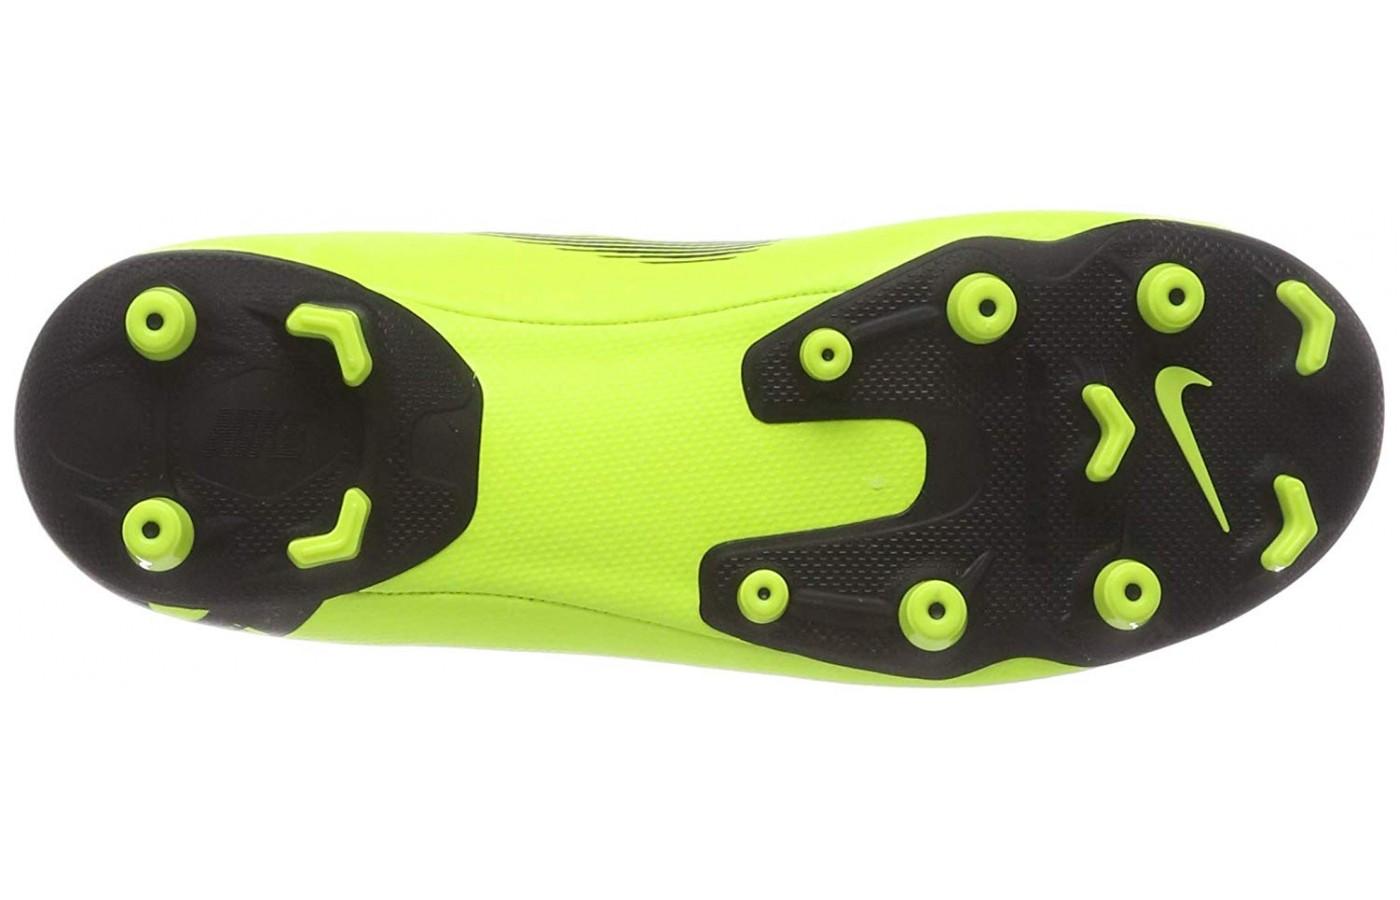 Nike Mercurial Vapor 12 Academy Sole